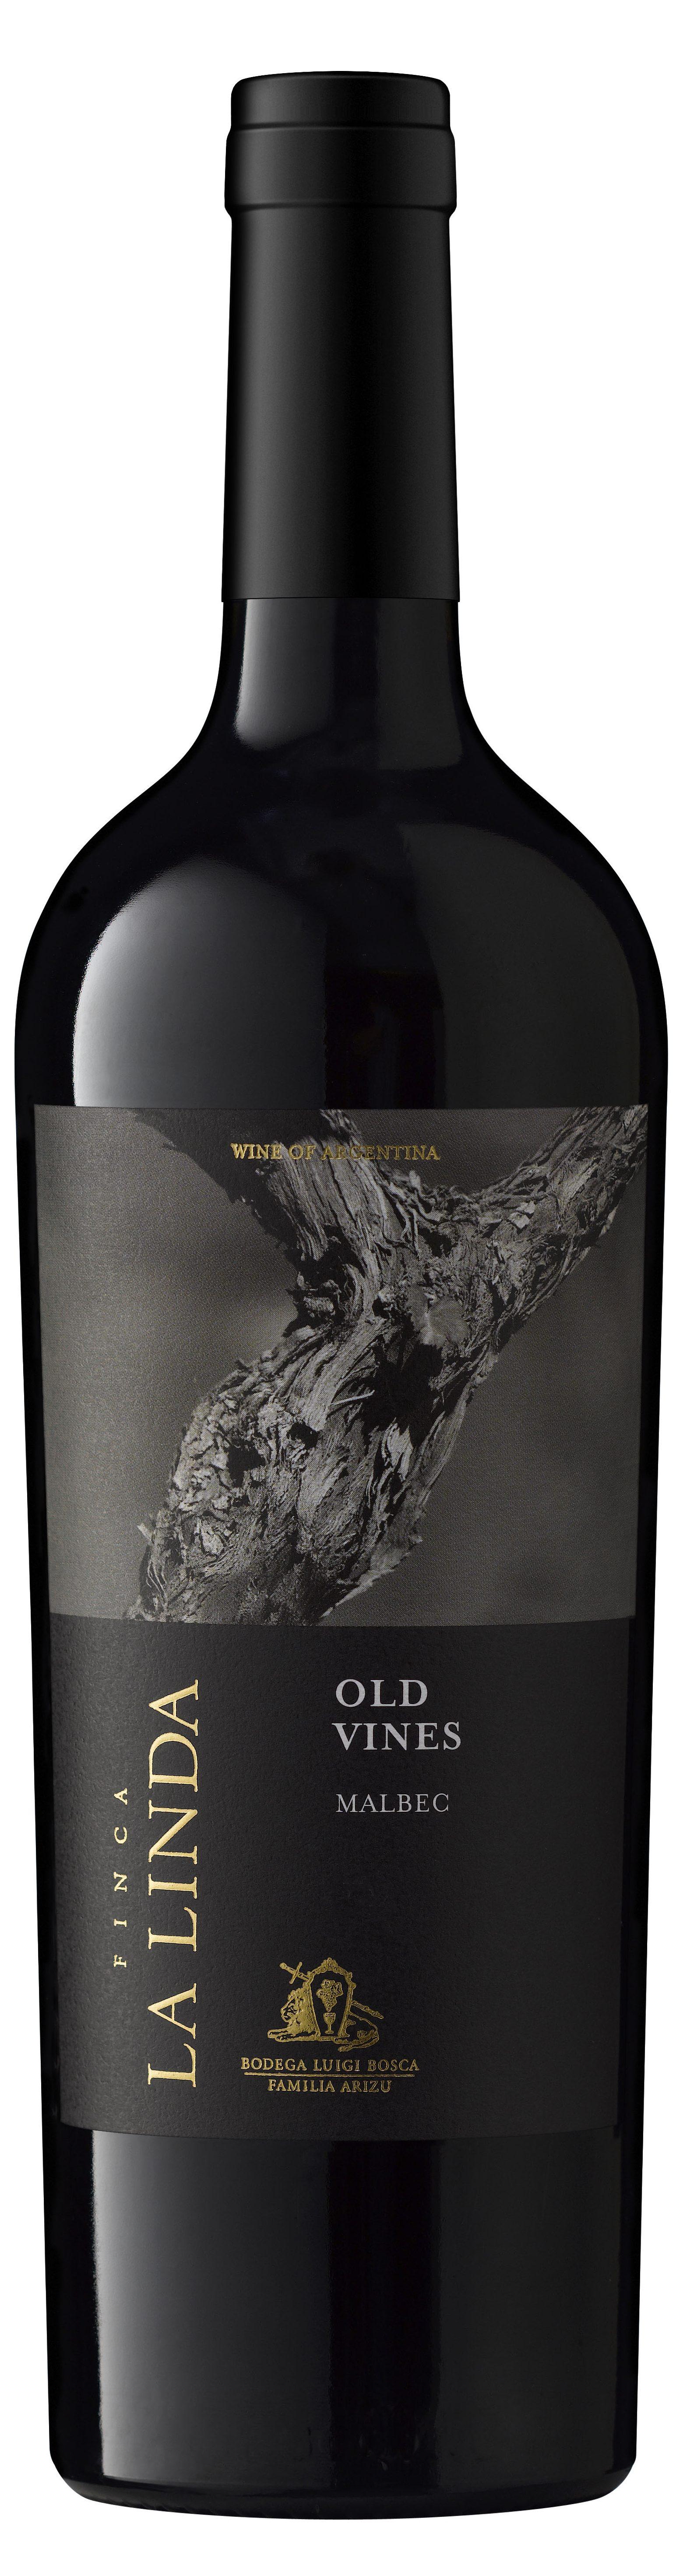 Luigi Bosca La Linda Private Selection Malbec Old Vines